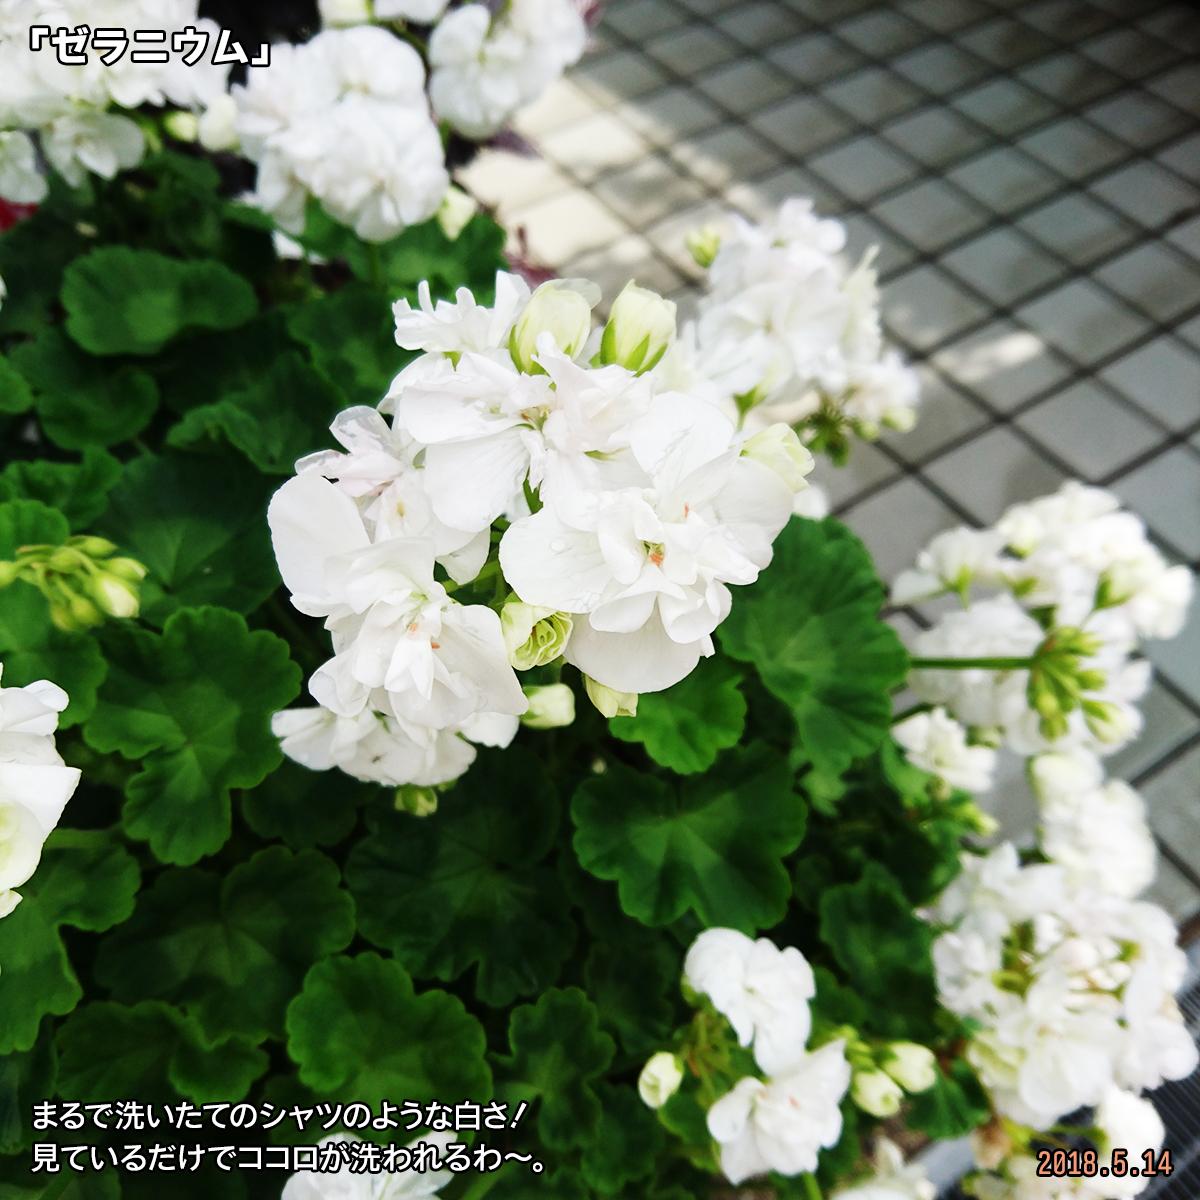 DSC_7293-1.jpg